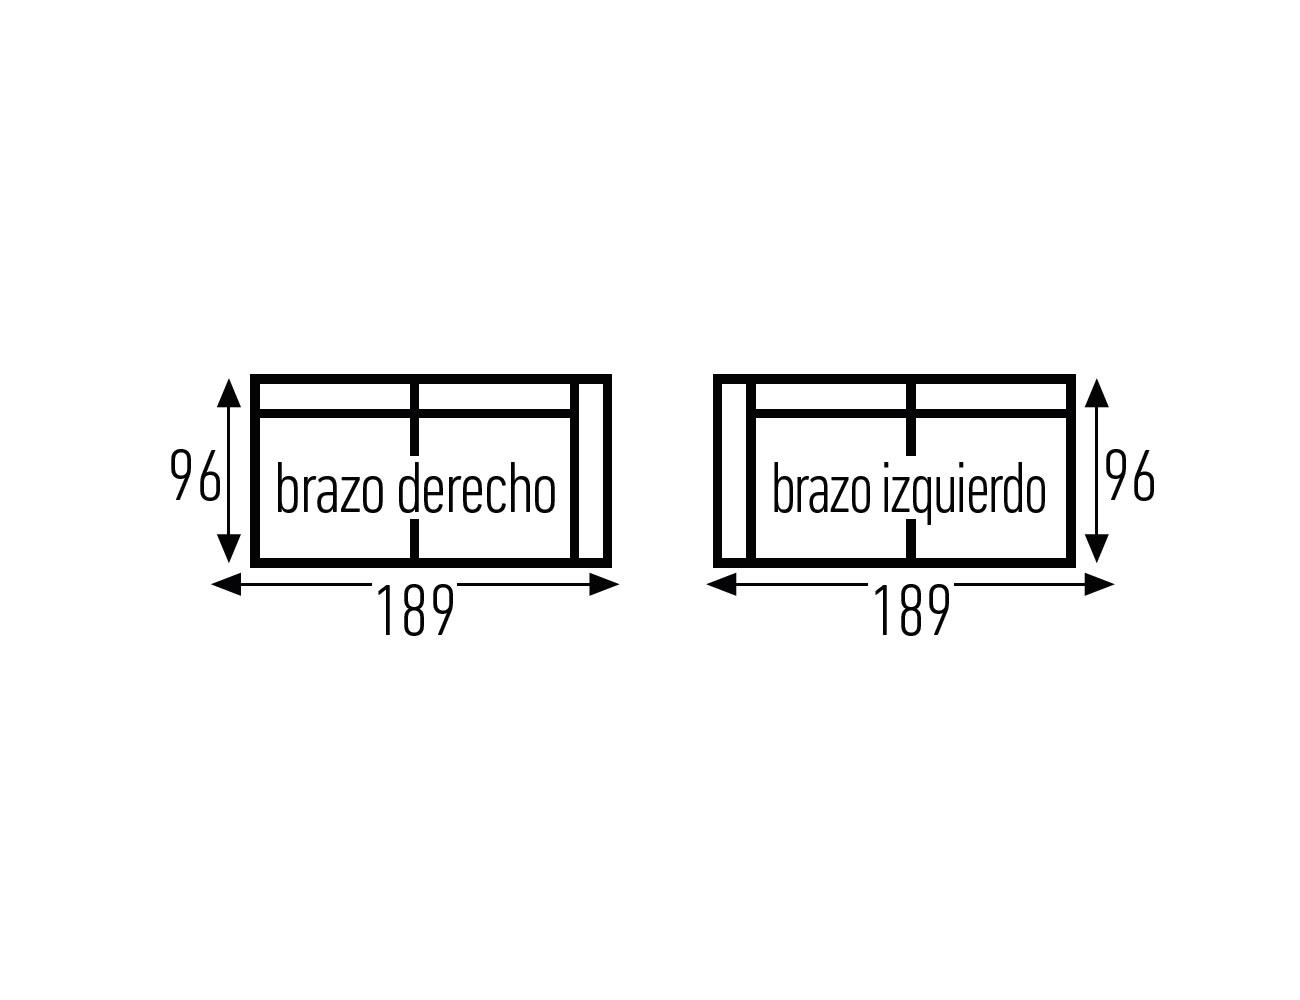 Croquis 3p sin 1 brazo 1898